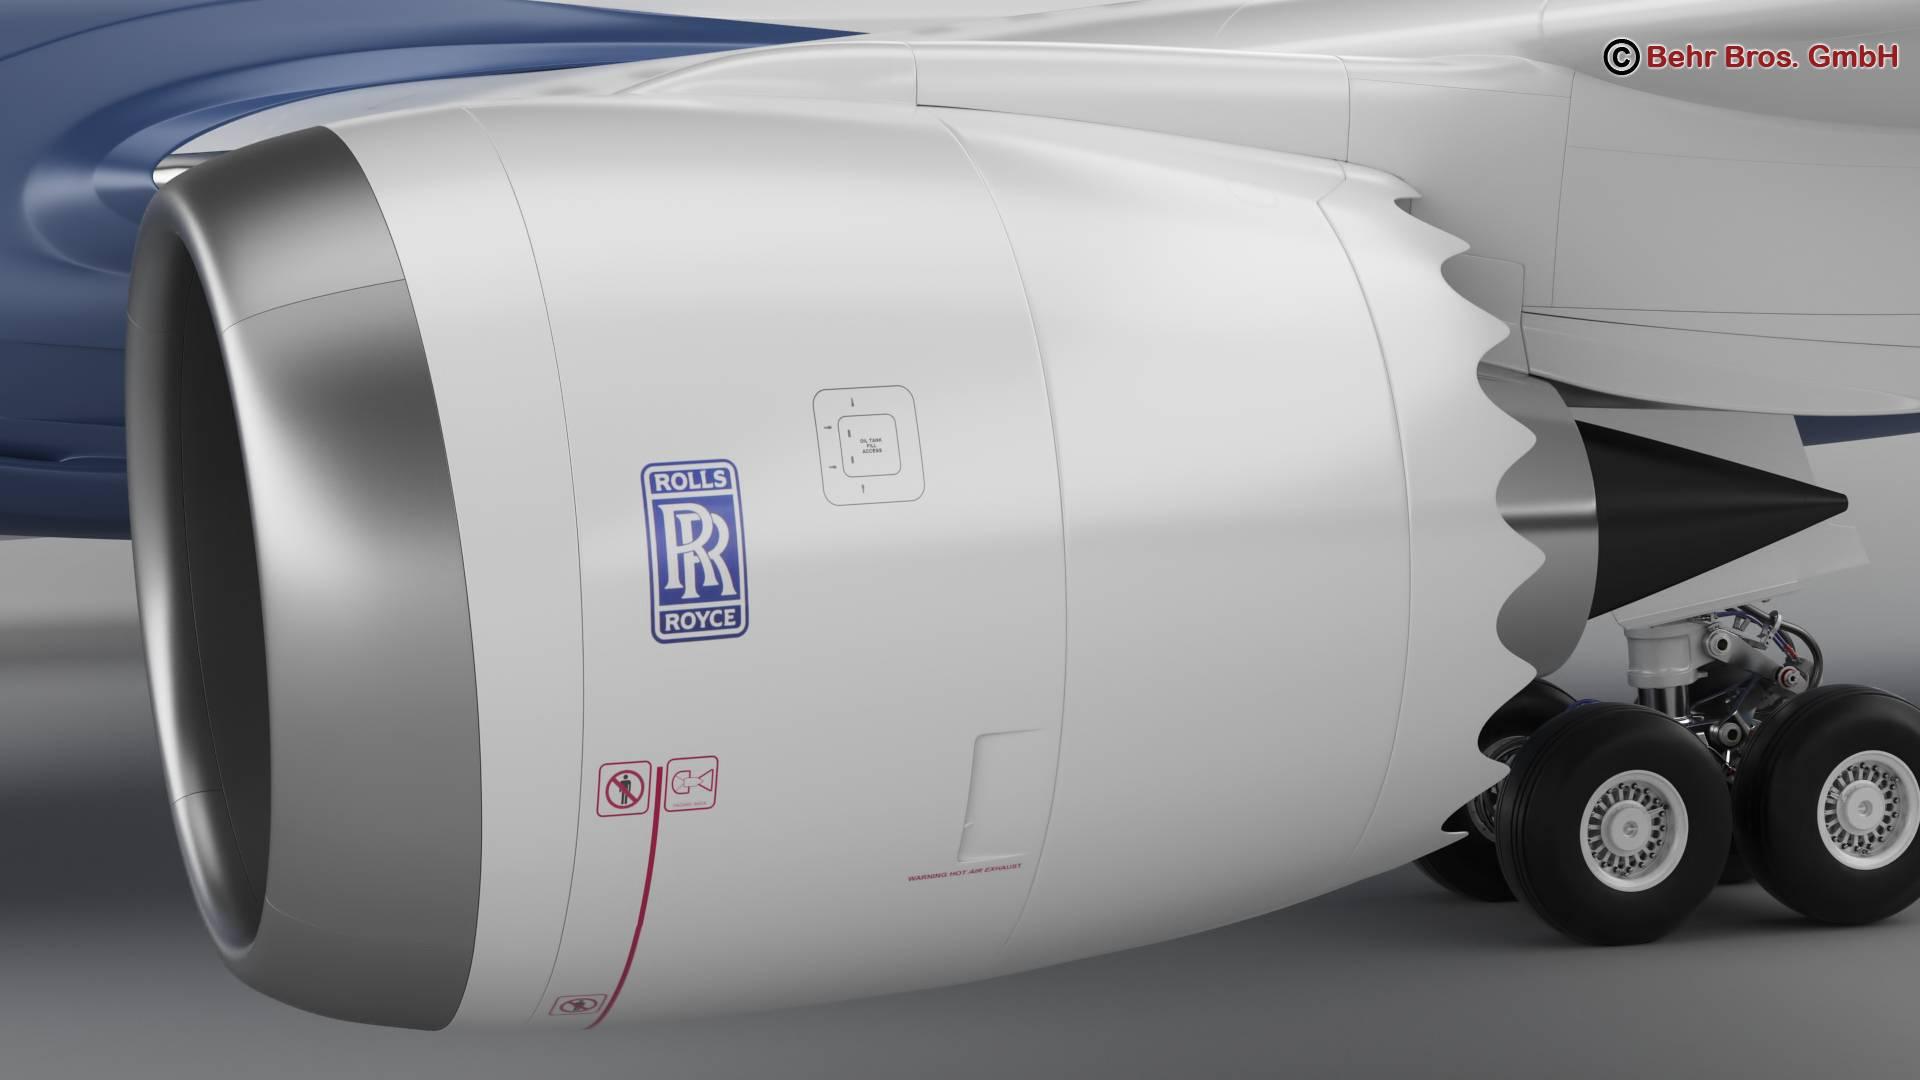 Boeing 787-8 3d gerð 3ds max fbx c4d lwo ma mb obj 251353